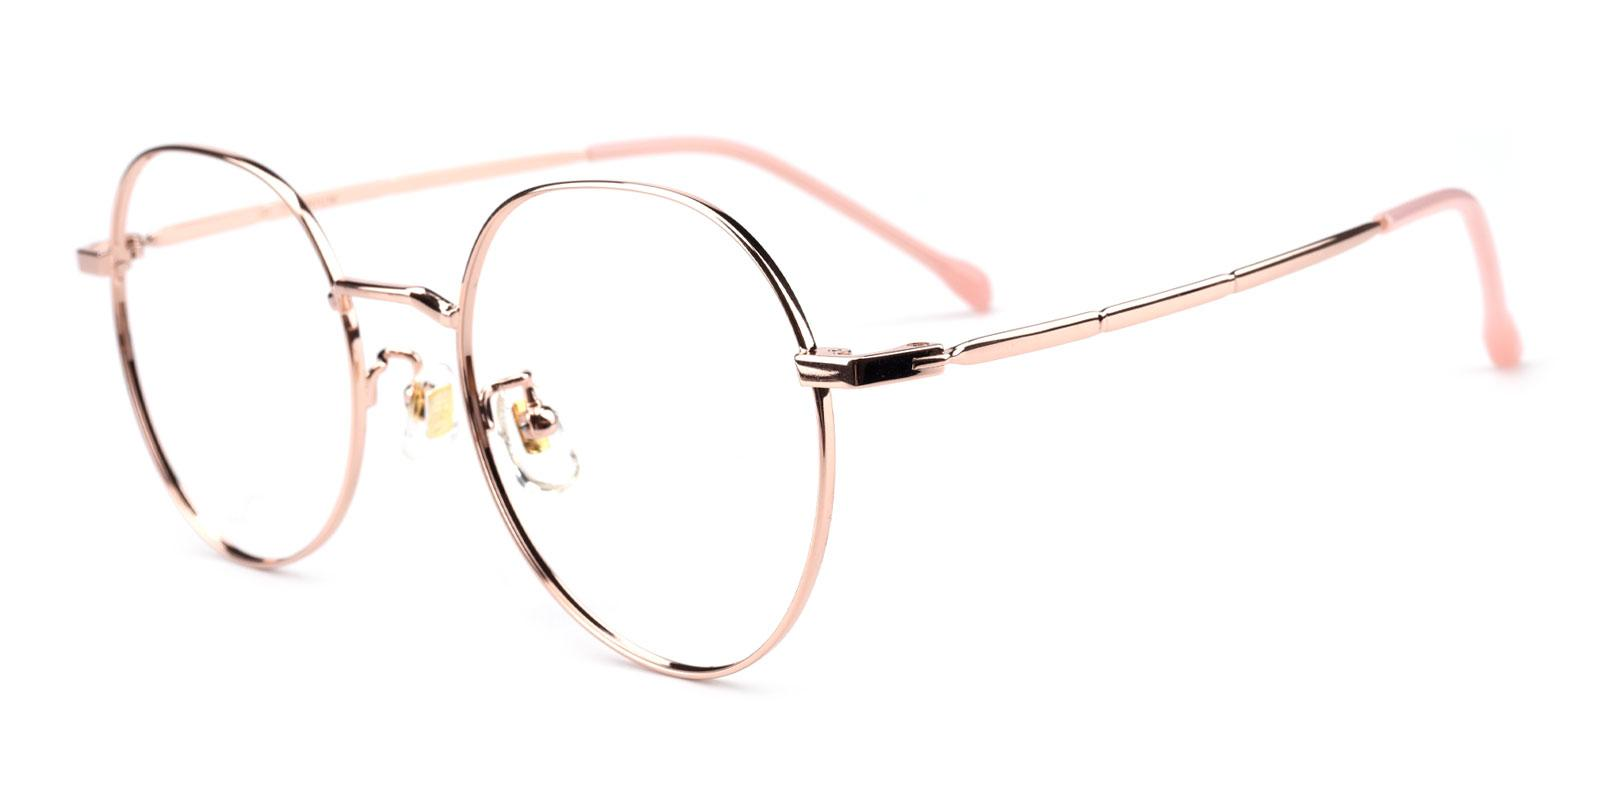 Berkeley-Pink-Round-Titanium-Eyeglasses-additional1